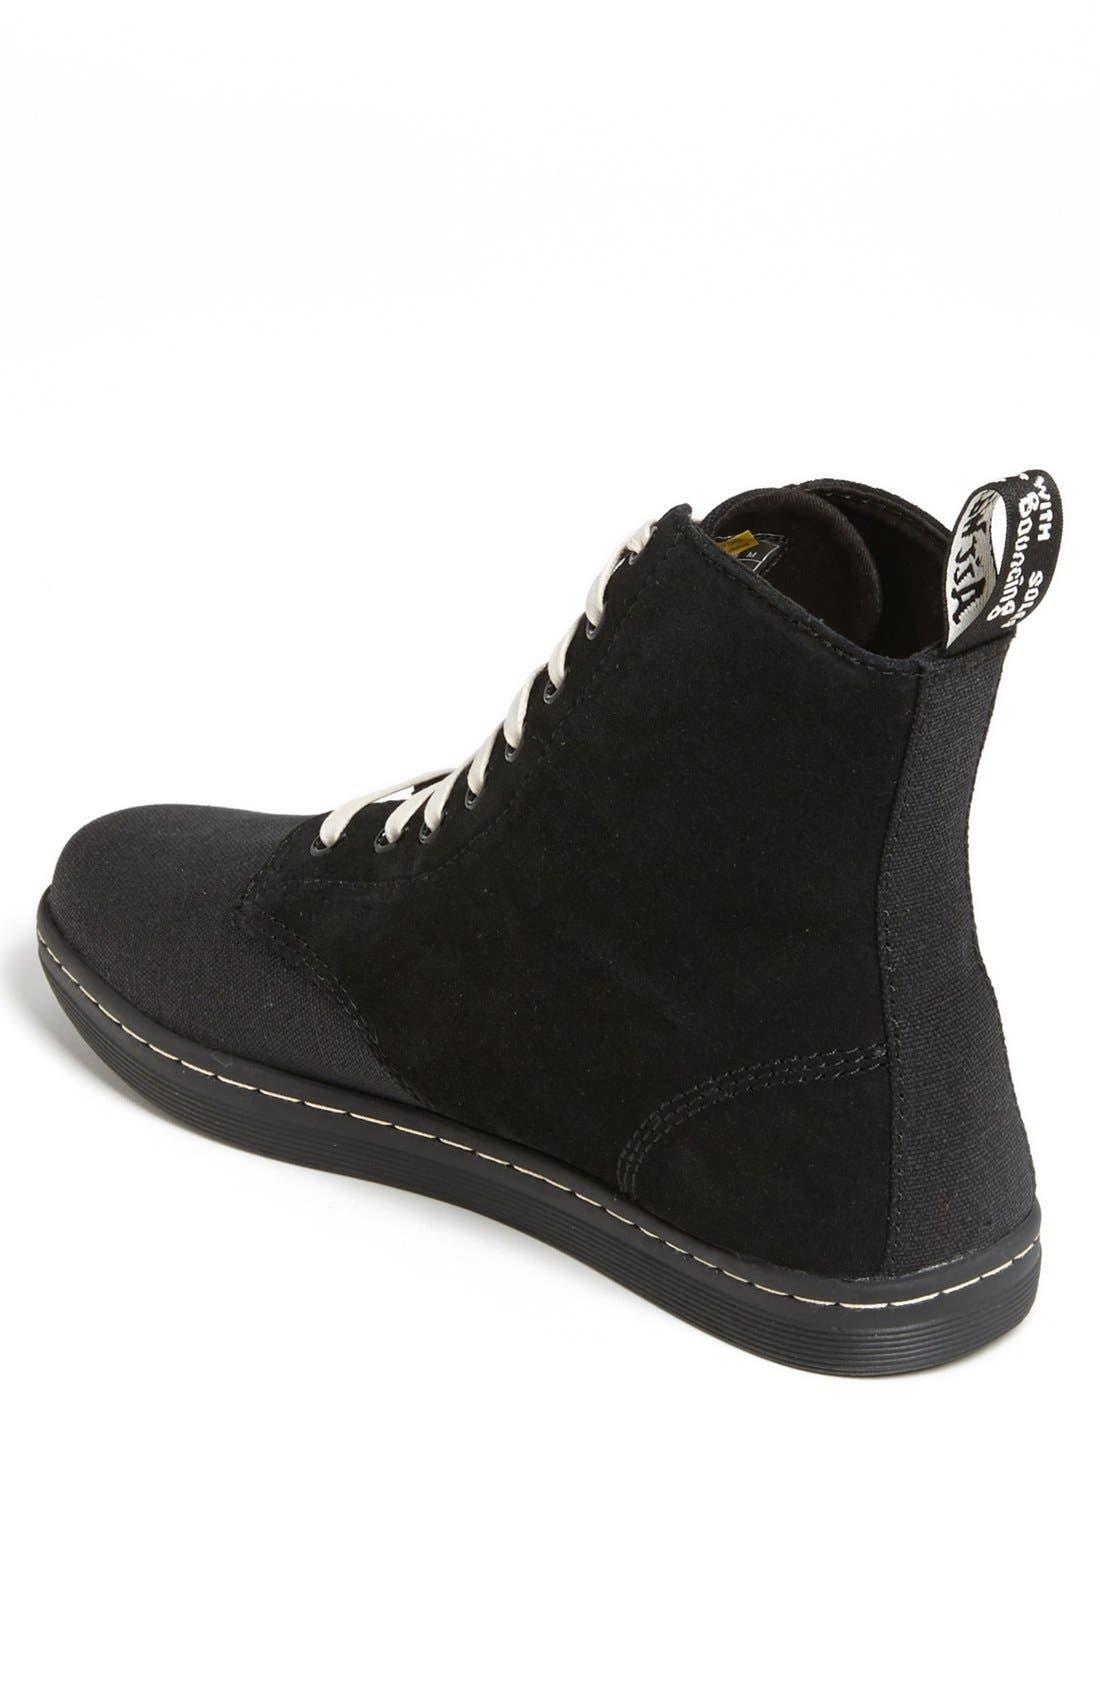 Alternate Image 2  - Dr. Martens 'Alfie' Sneaker